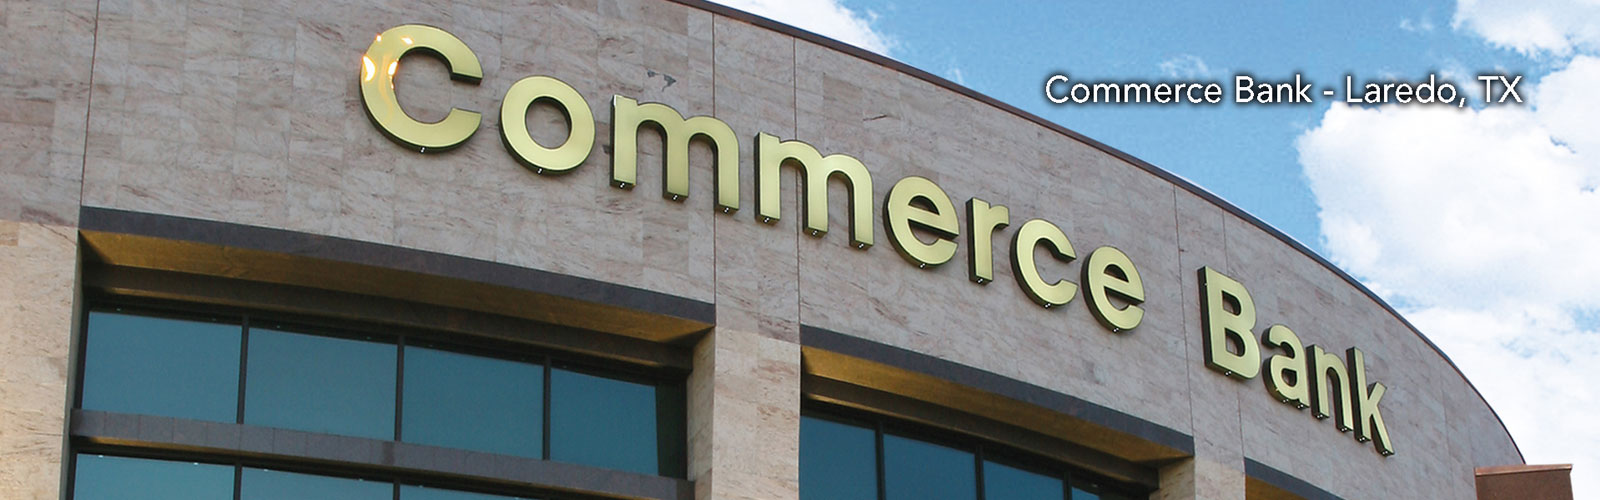 Commerce Bank Laredo Texas